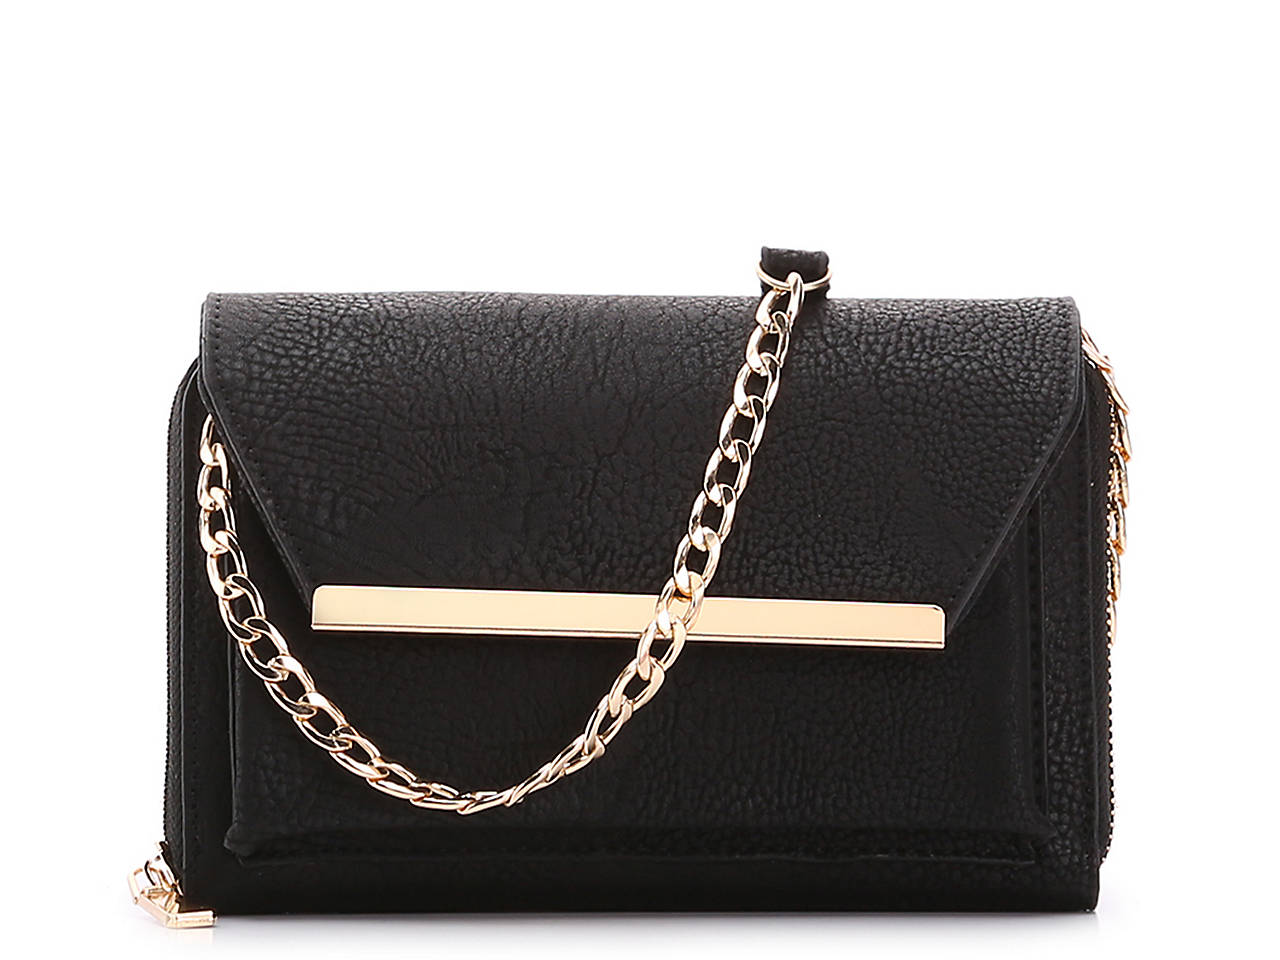 Bar Crossbody Bag